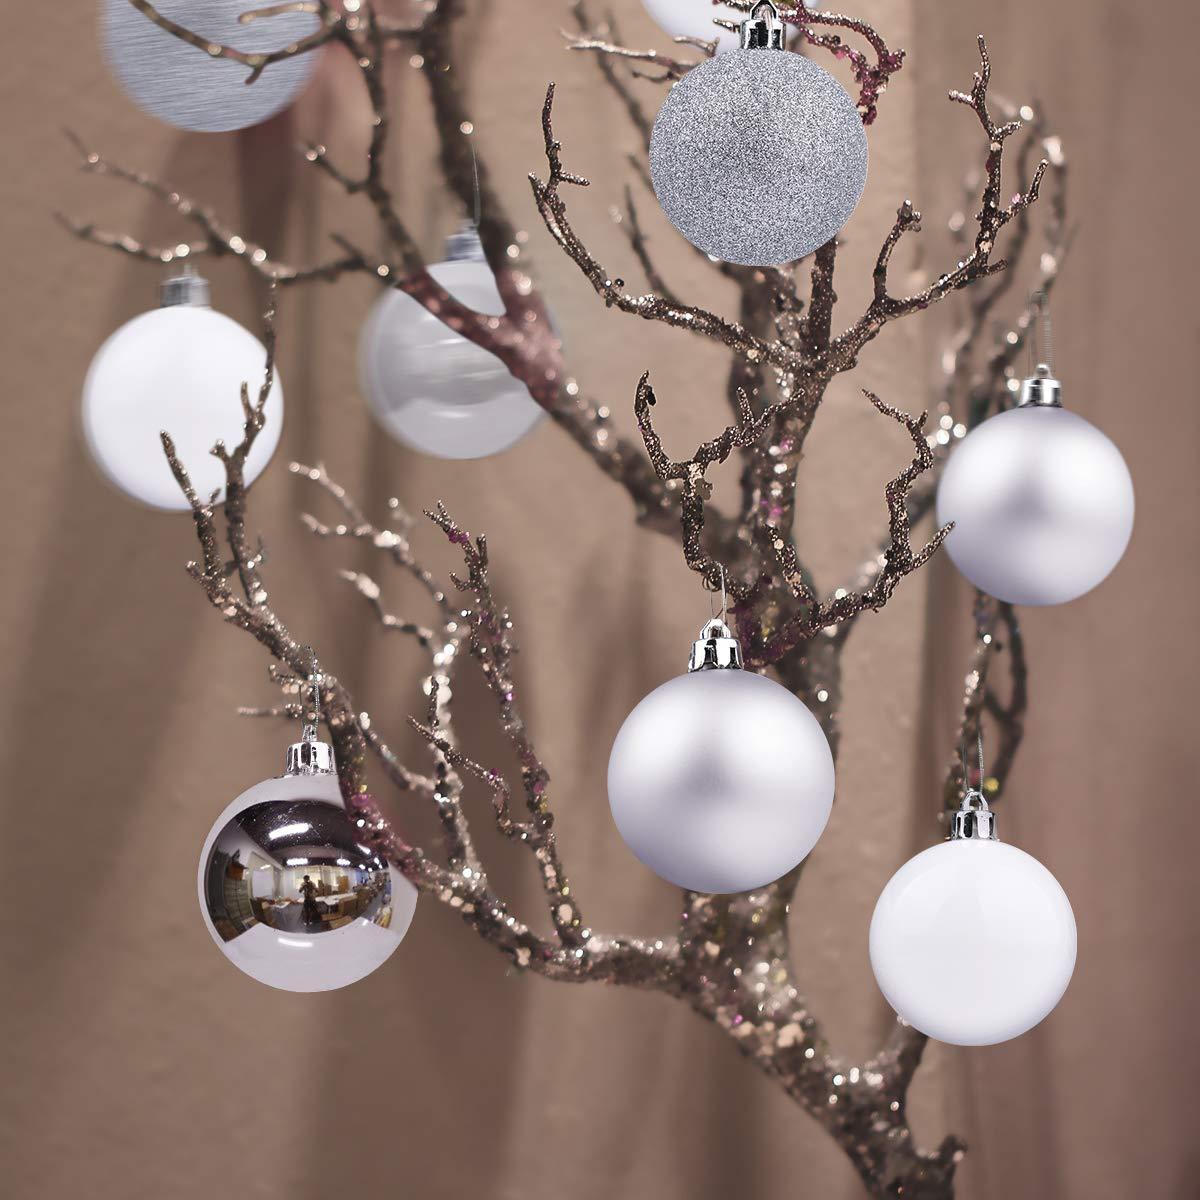 Shatterproof Christmas Tree Decorations Large Hanging Ball Blue 2.5 Christmas Balls Ornaments for Xmas Tree